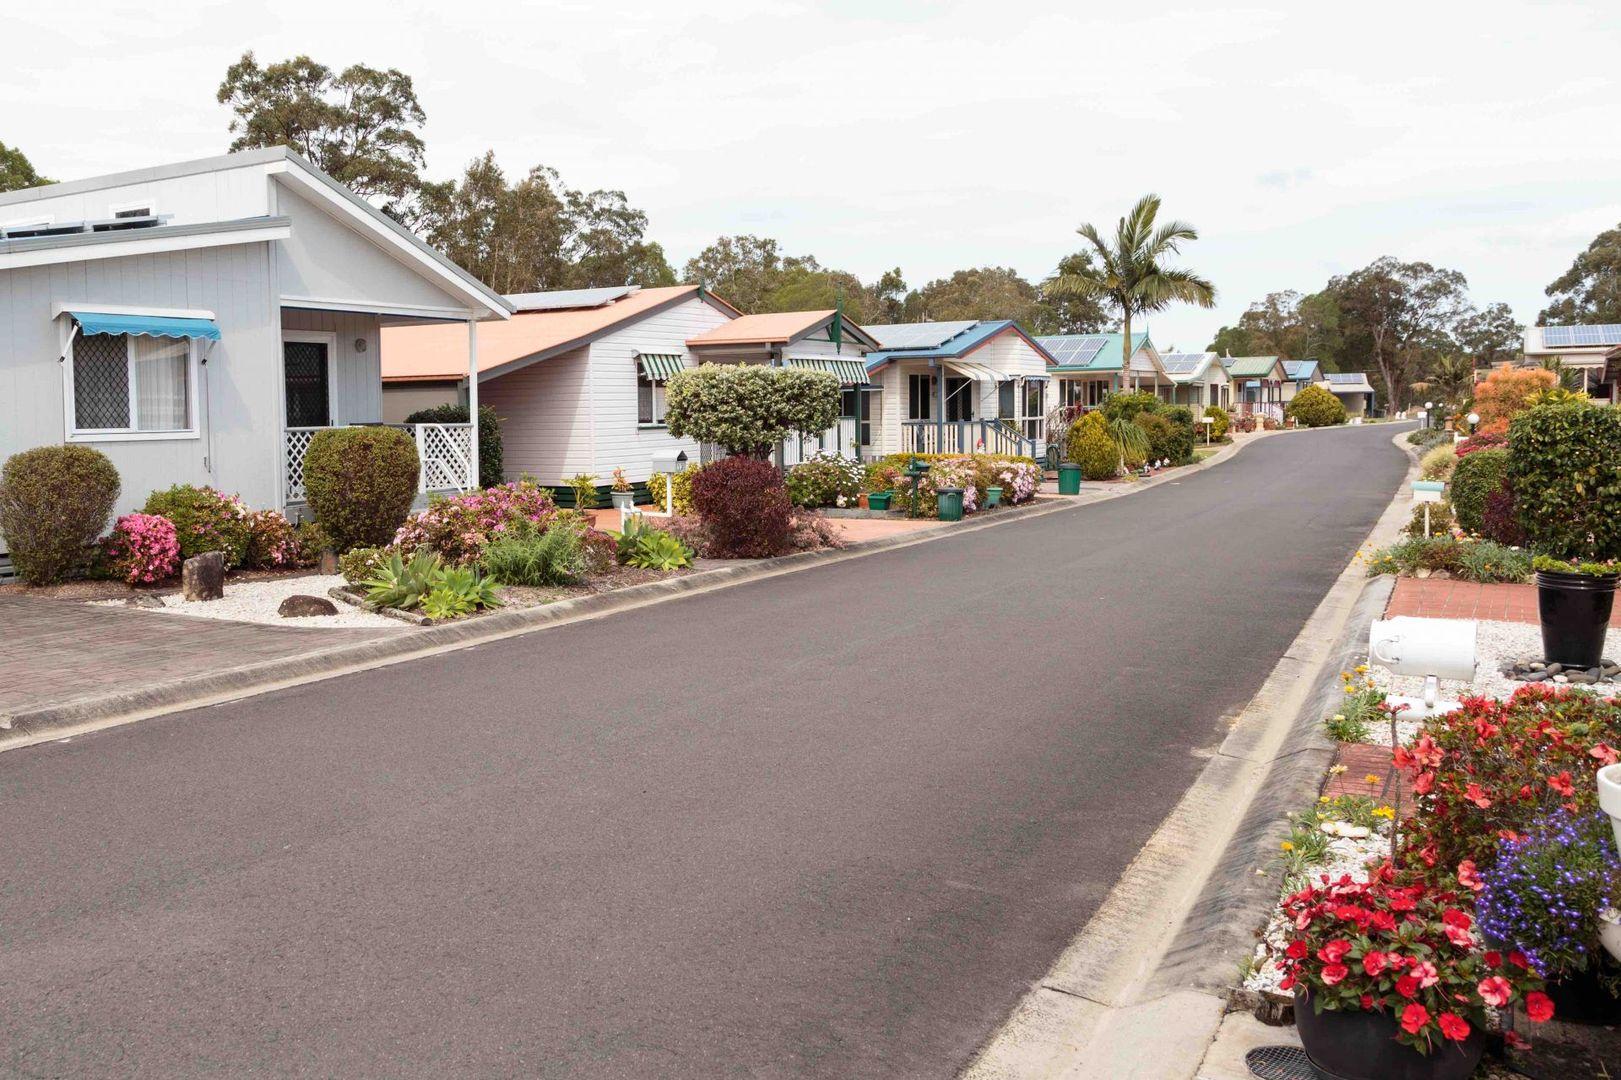 570 woodburn evans head road, Doonbah NSW 2473, Image 2